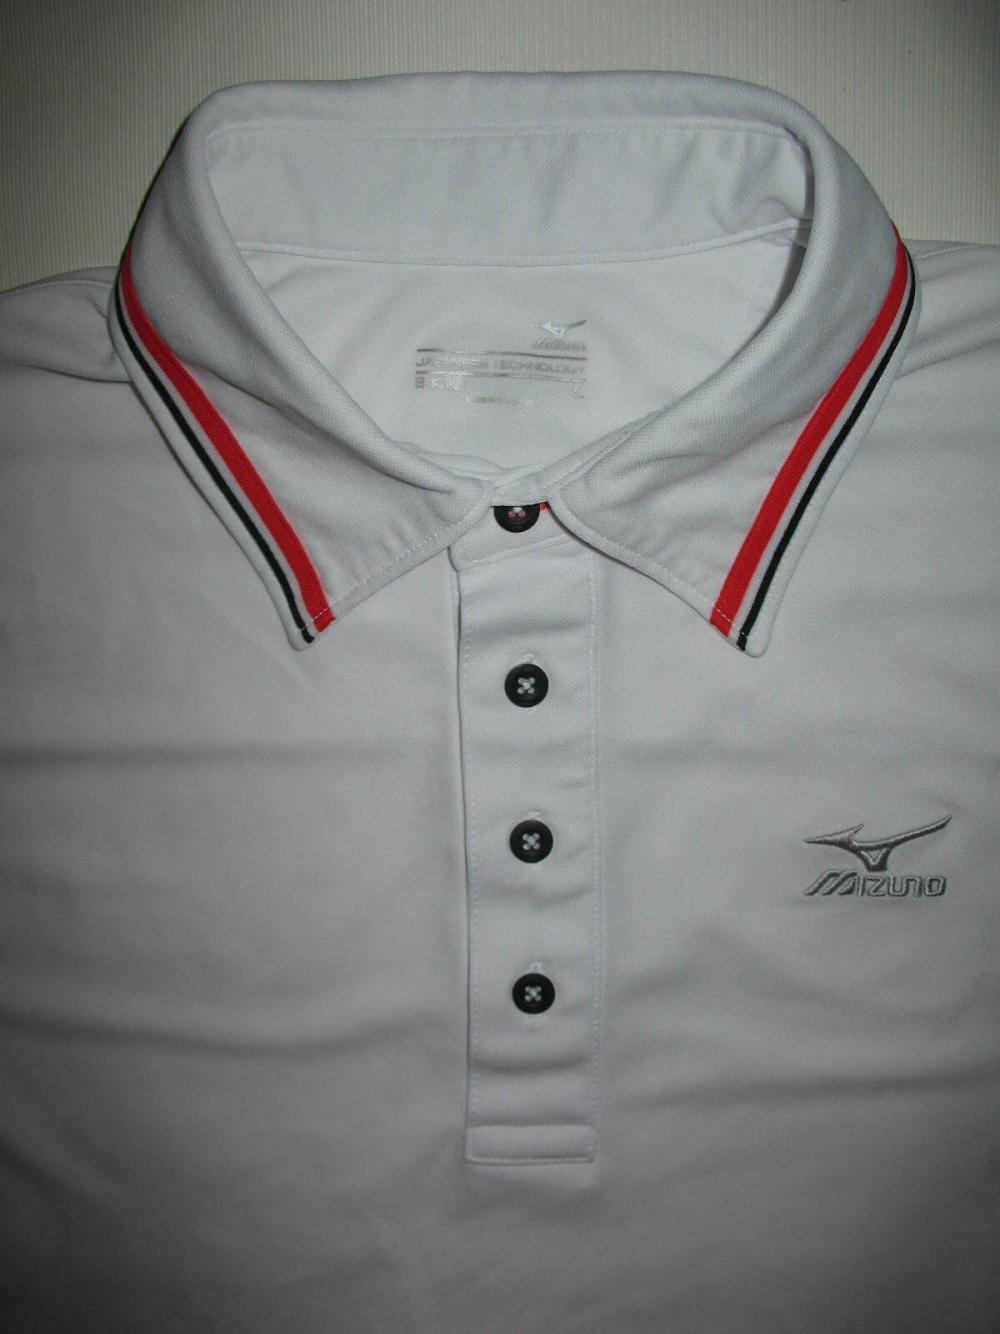 Футболка MIZUNO  Drylite Ice Touch Pique Golf Shirt (размер L) - 4